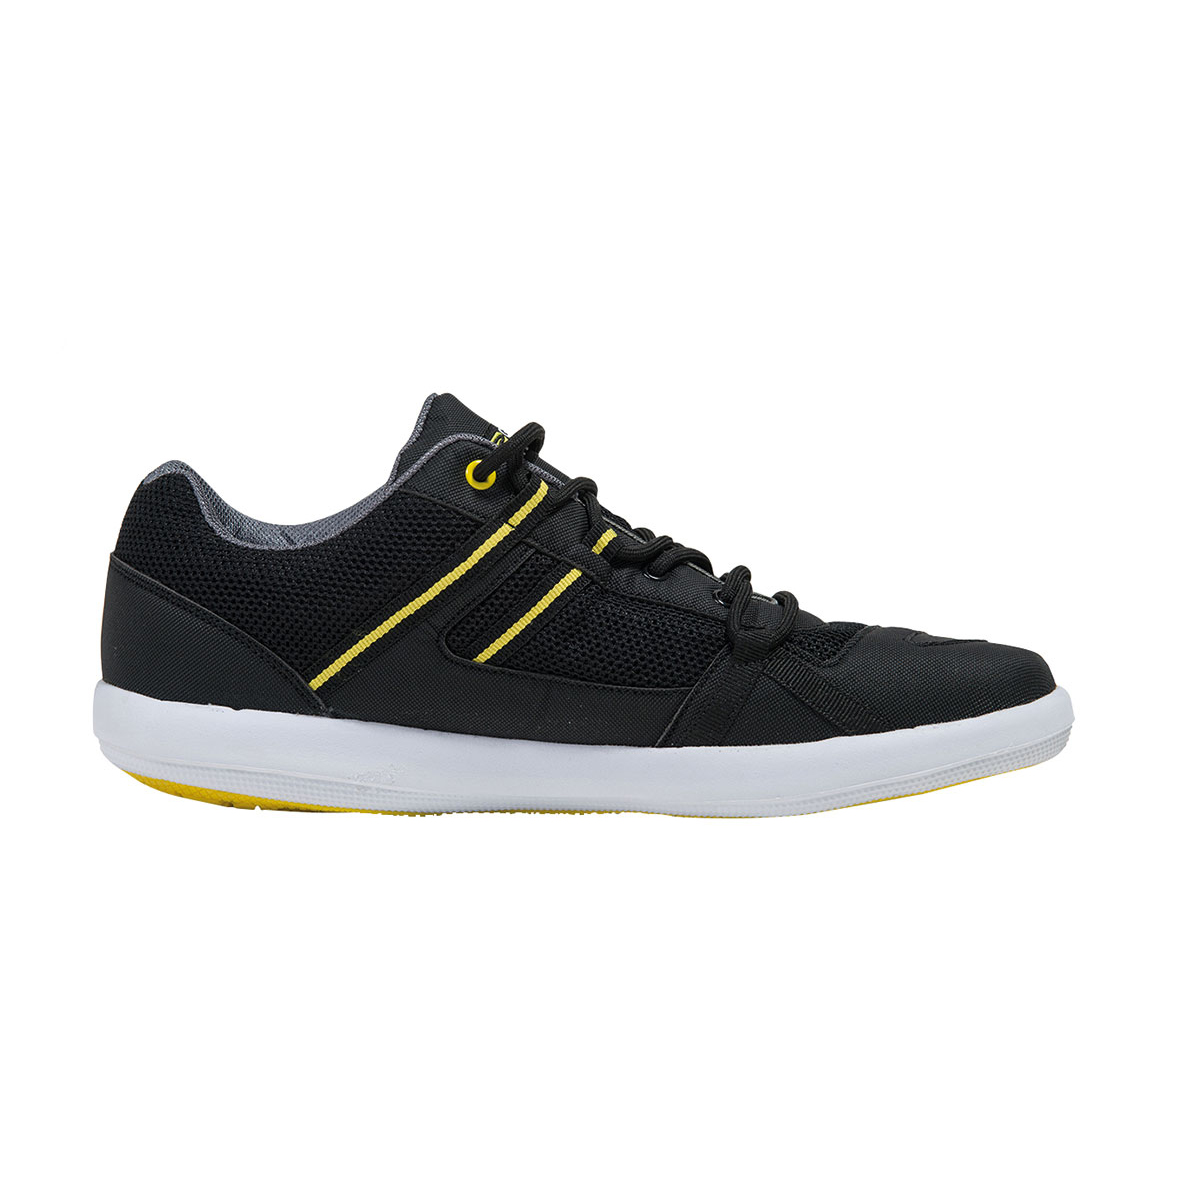 Gul Aqua Grip Hydro Shoes 2018 - Black/Yellow | Cyber ...